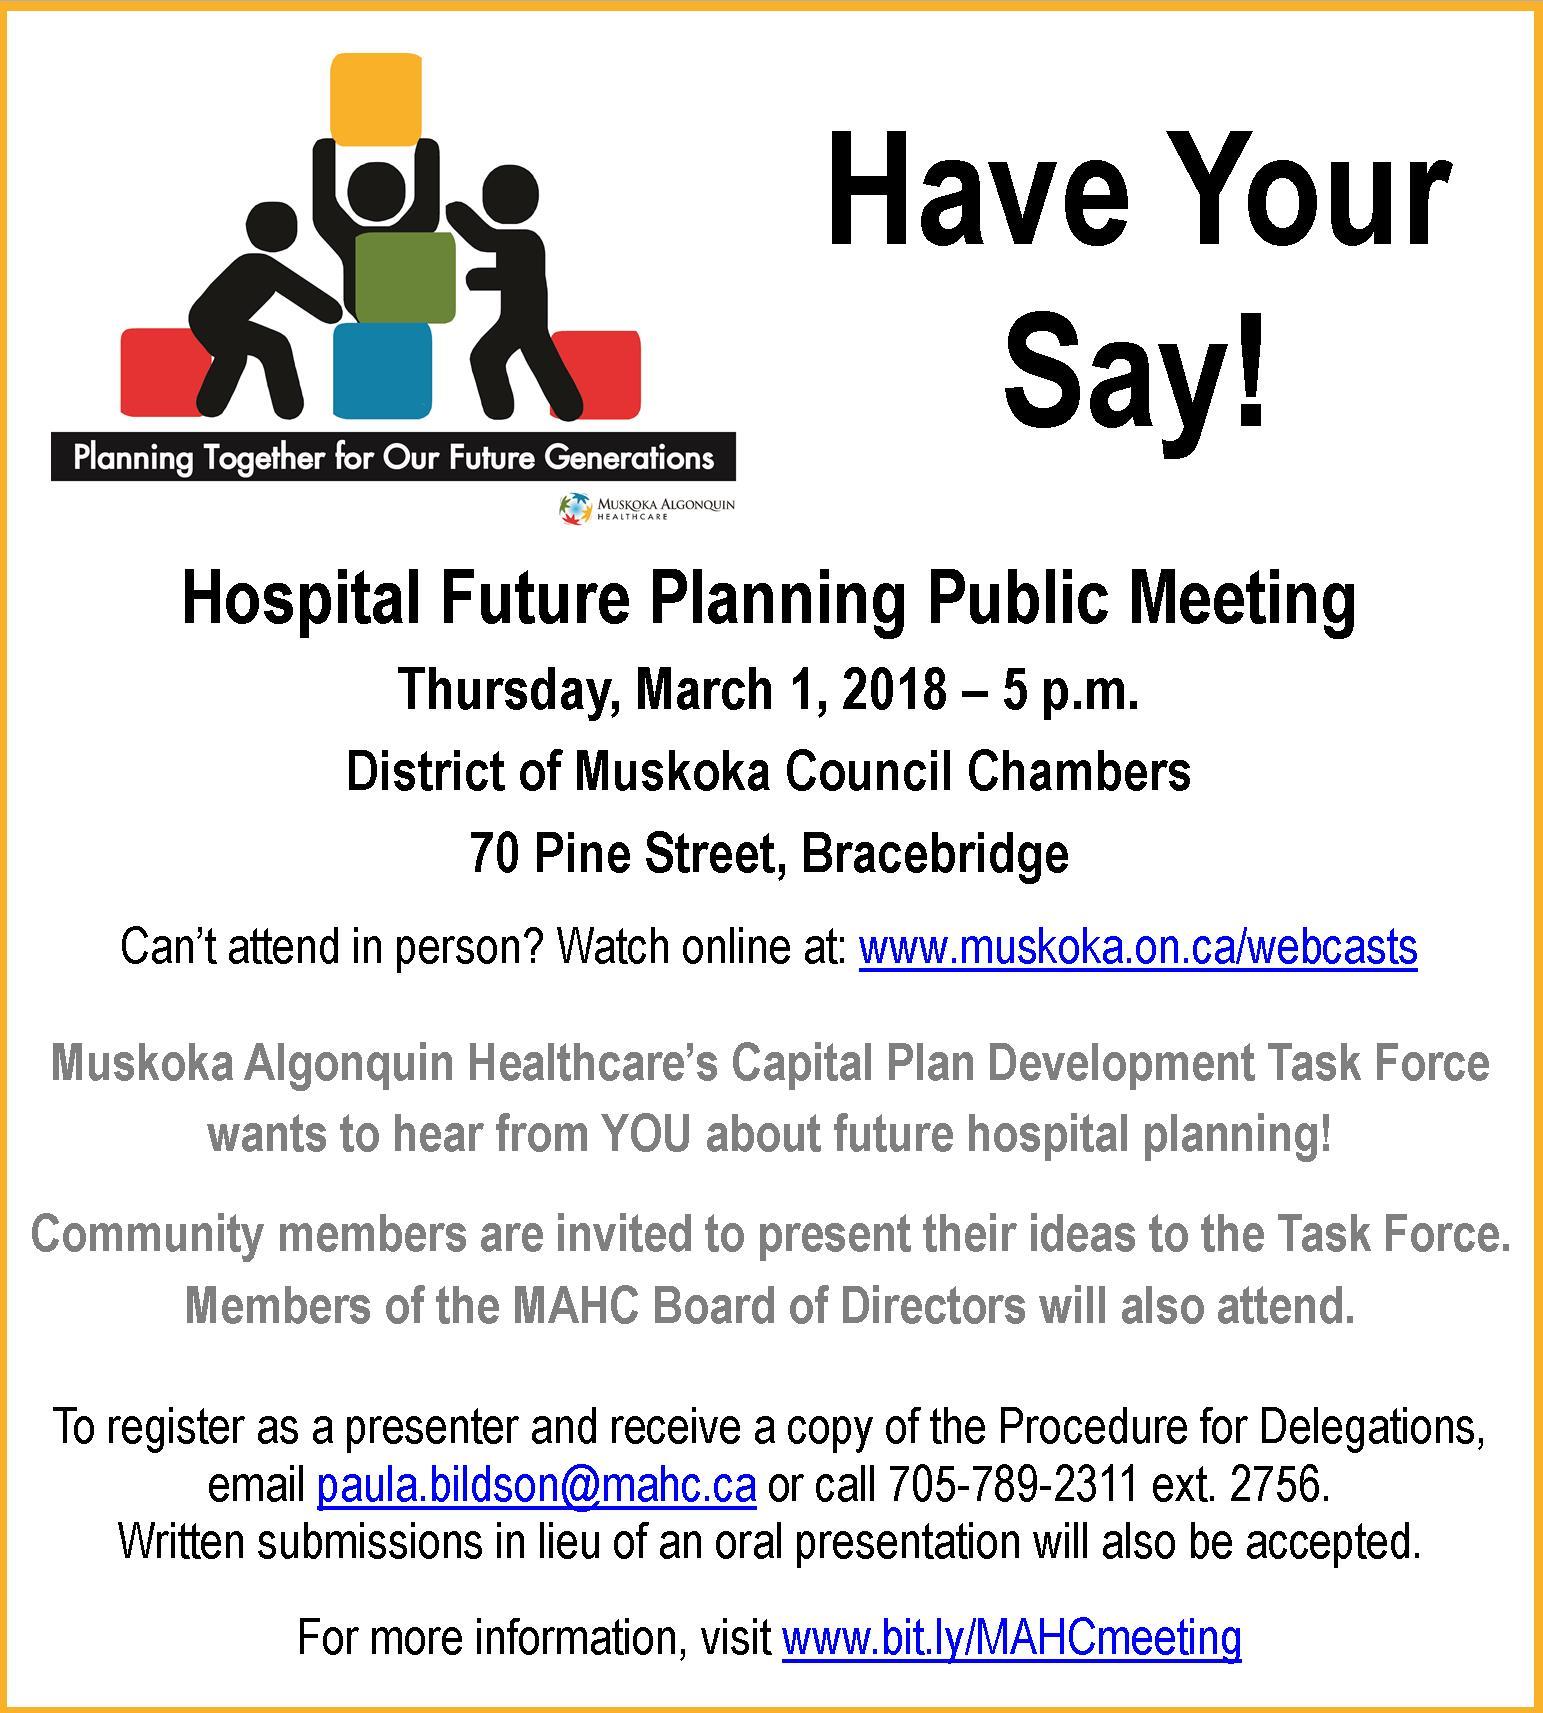 Public Notice of March 1 Public Meeting